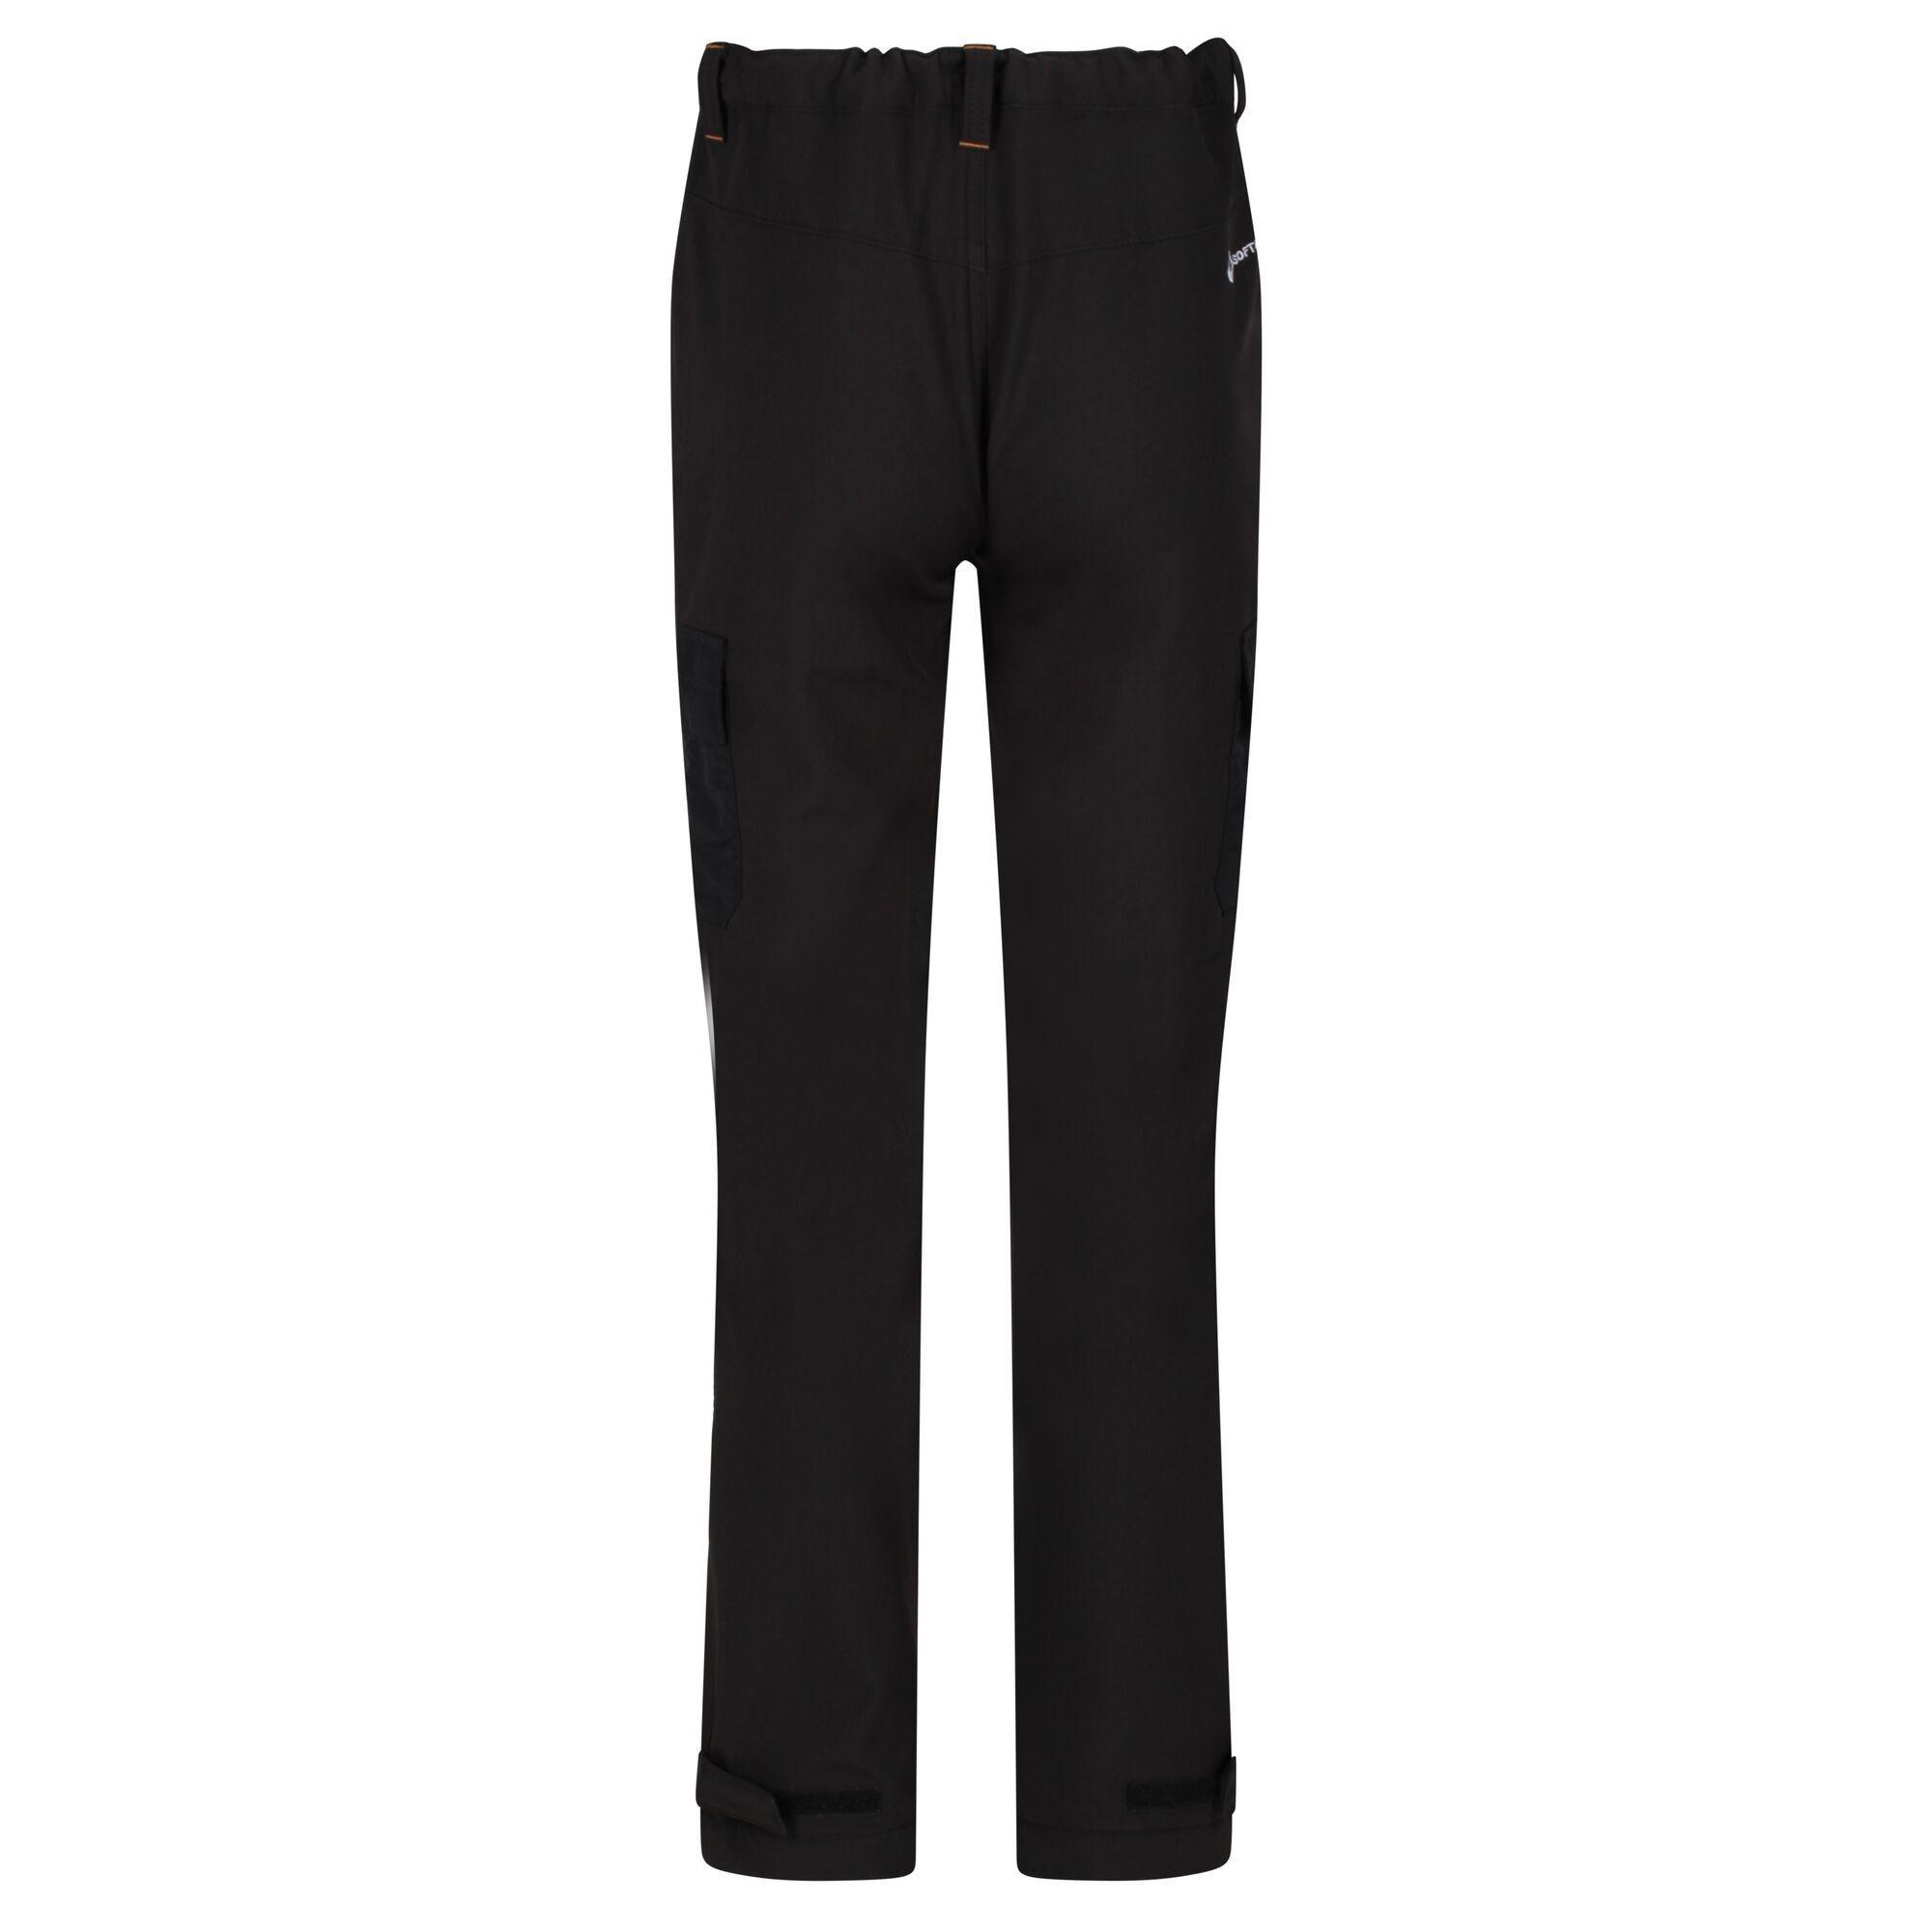 Regatta-Pantalon-softshell-hydrofuge-Garcon-RG618